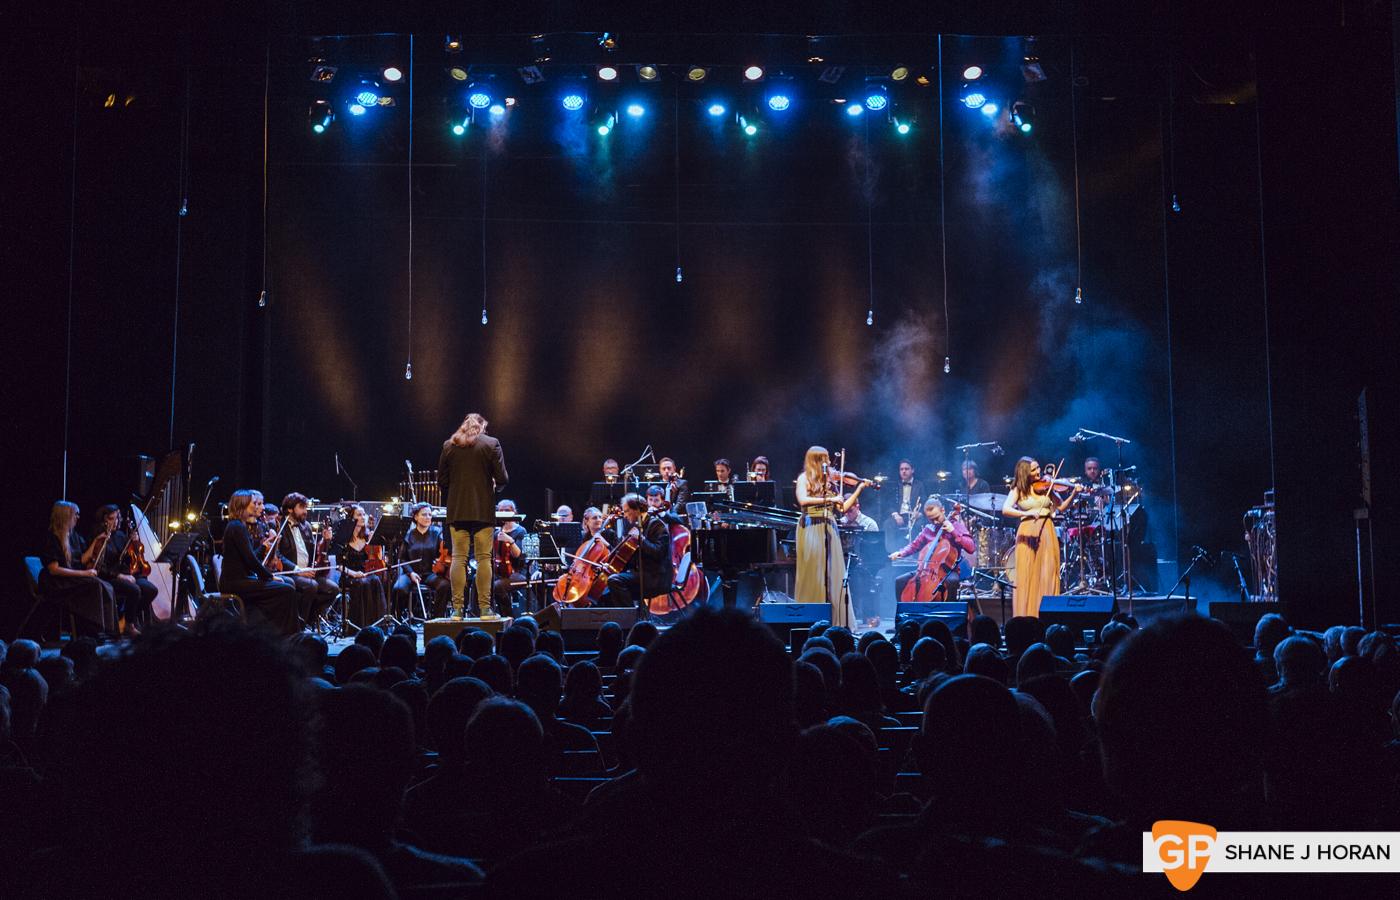 Strung w- Cork Opera House Concert Orchestra, Cork Opera House, RHRN, Shane J Horan, Cork, 23-02-2020-4